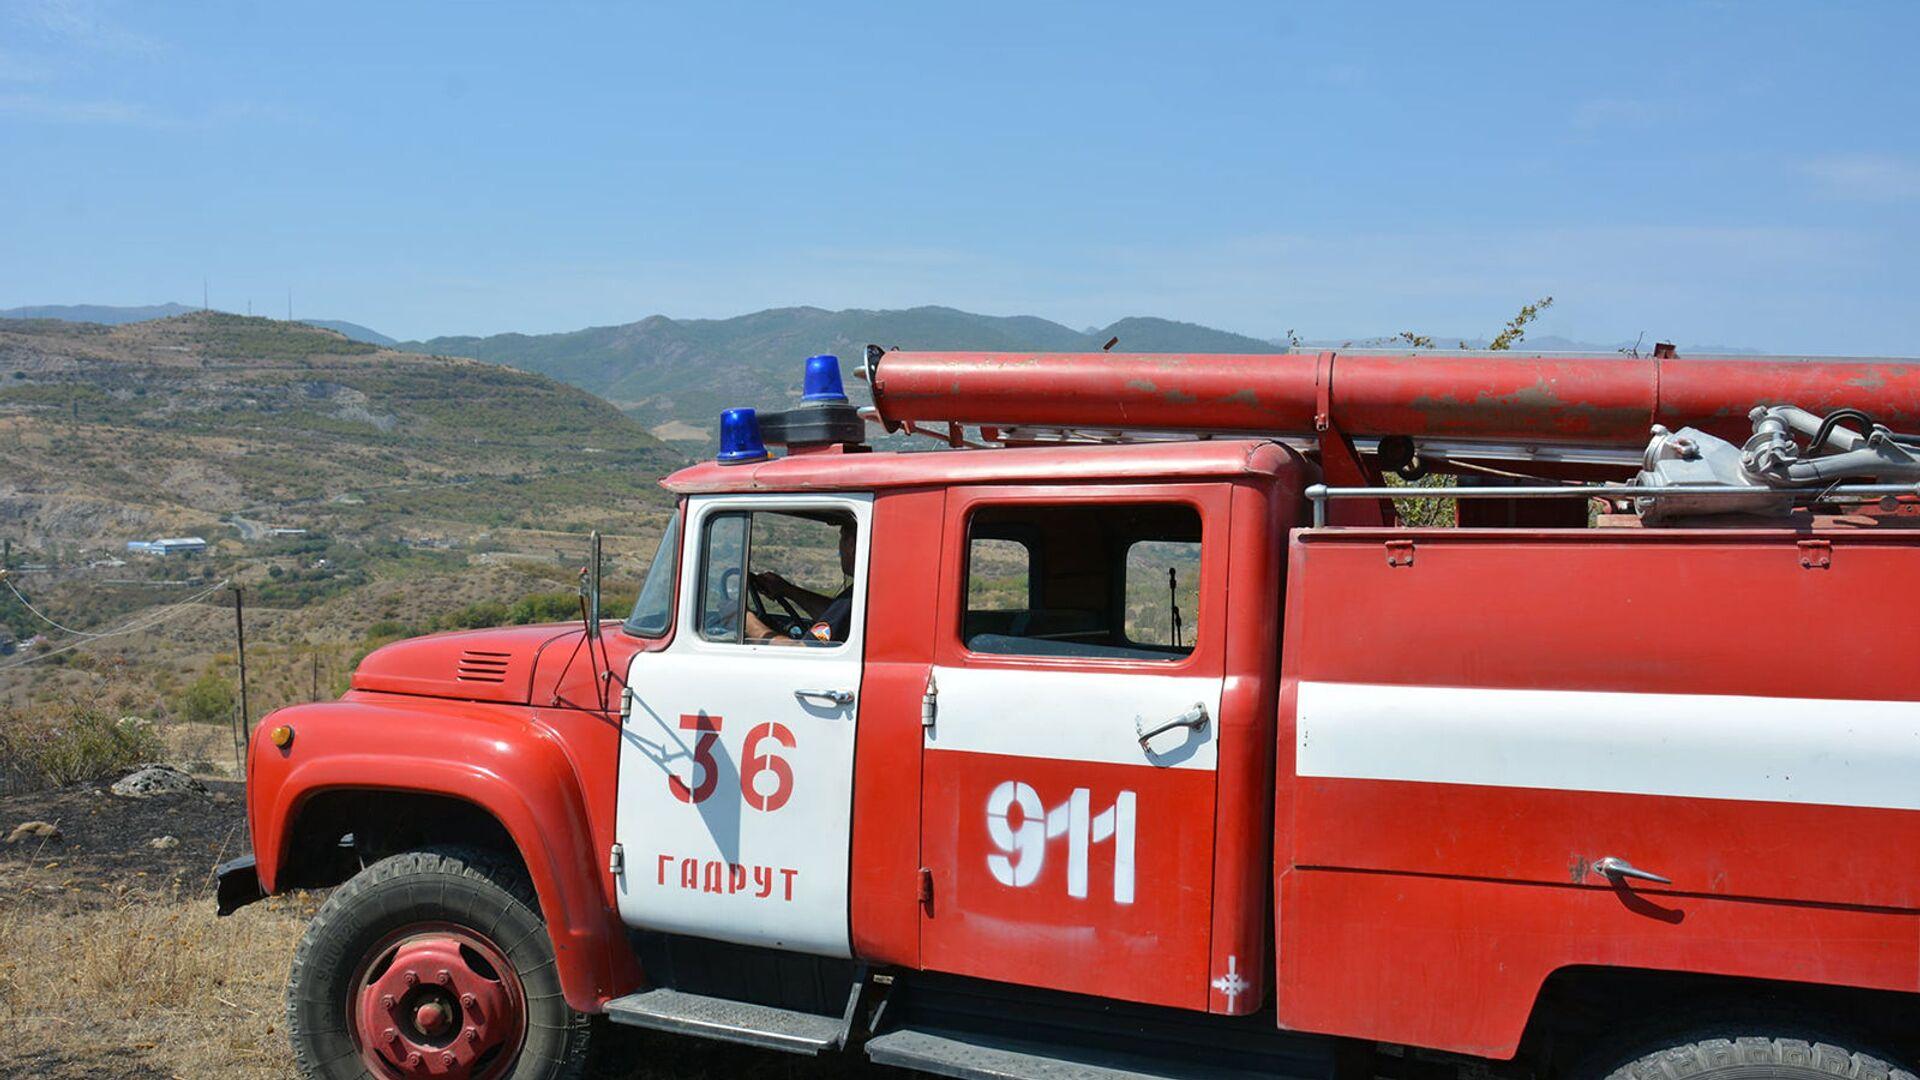 Пожарная машина МЧС в Карабахе - Sputnik Արմենիա, 1920, 04.09.2021